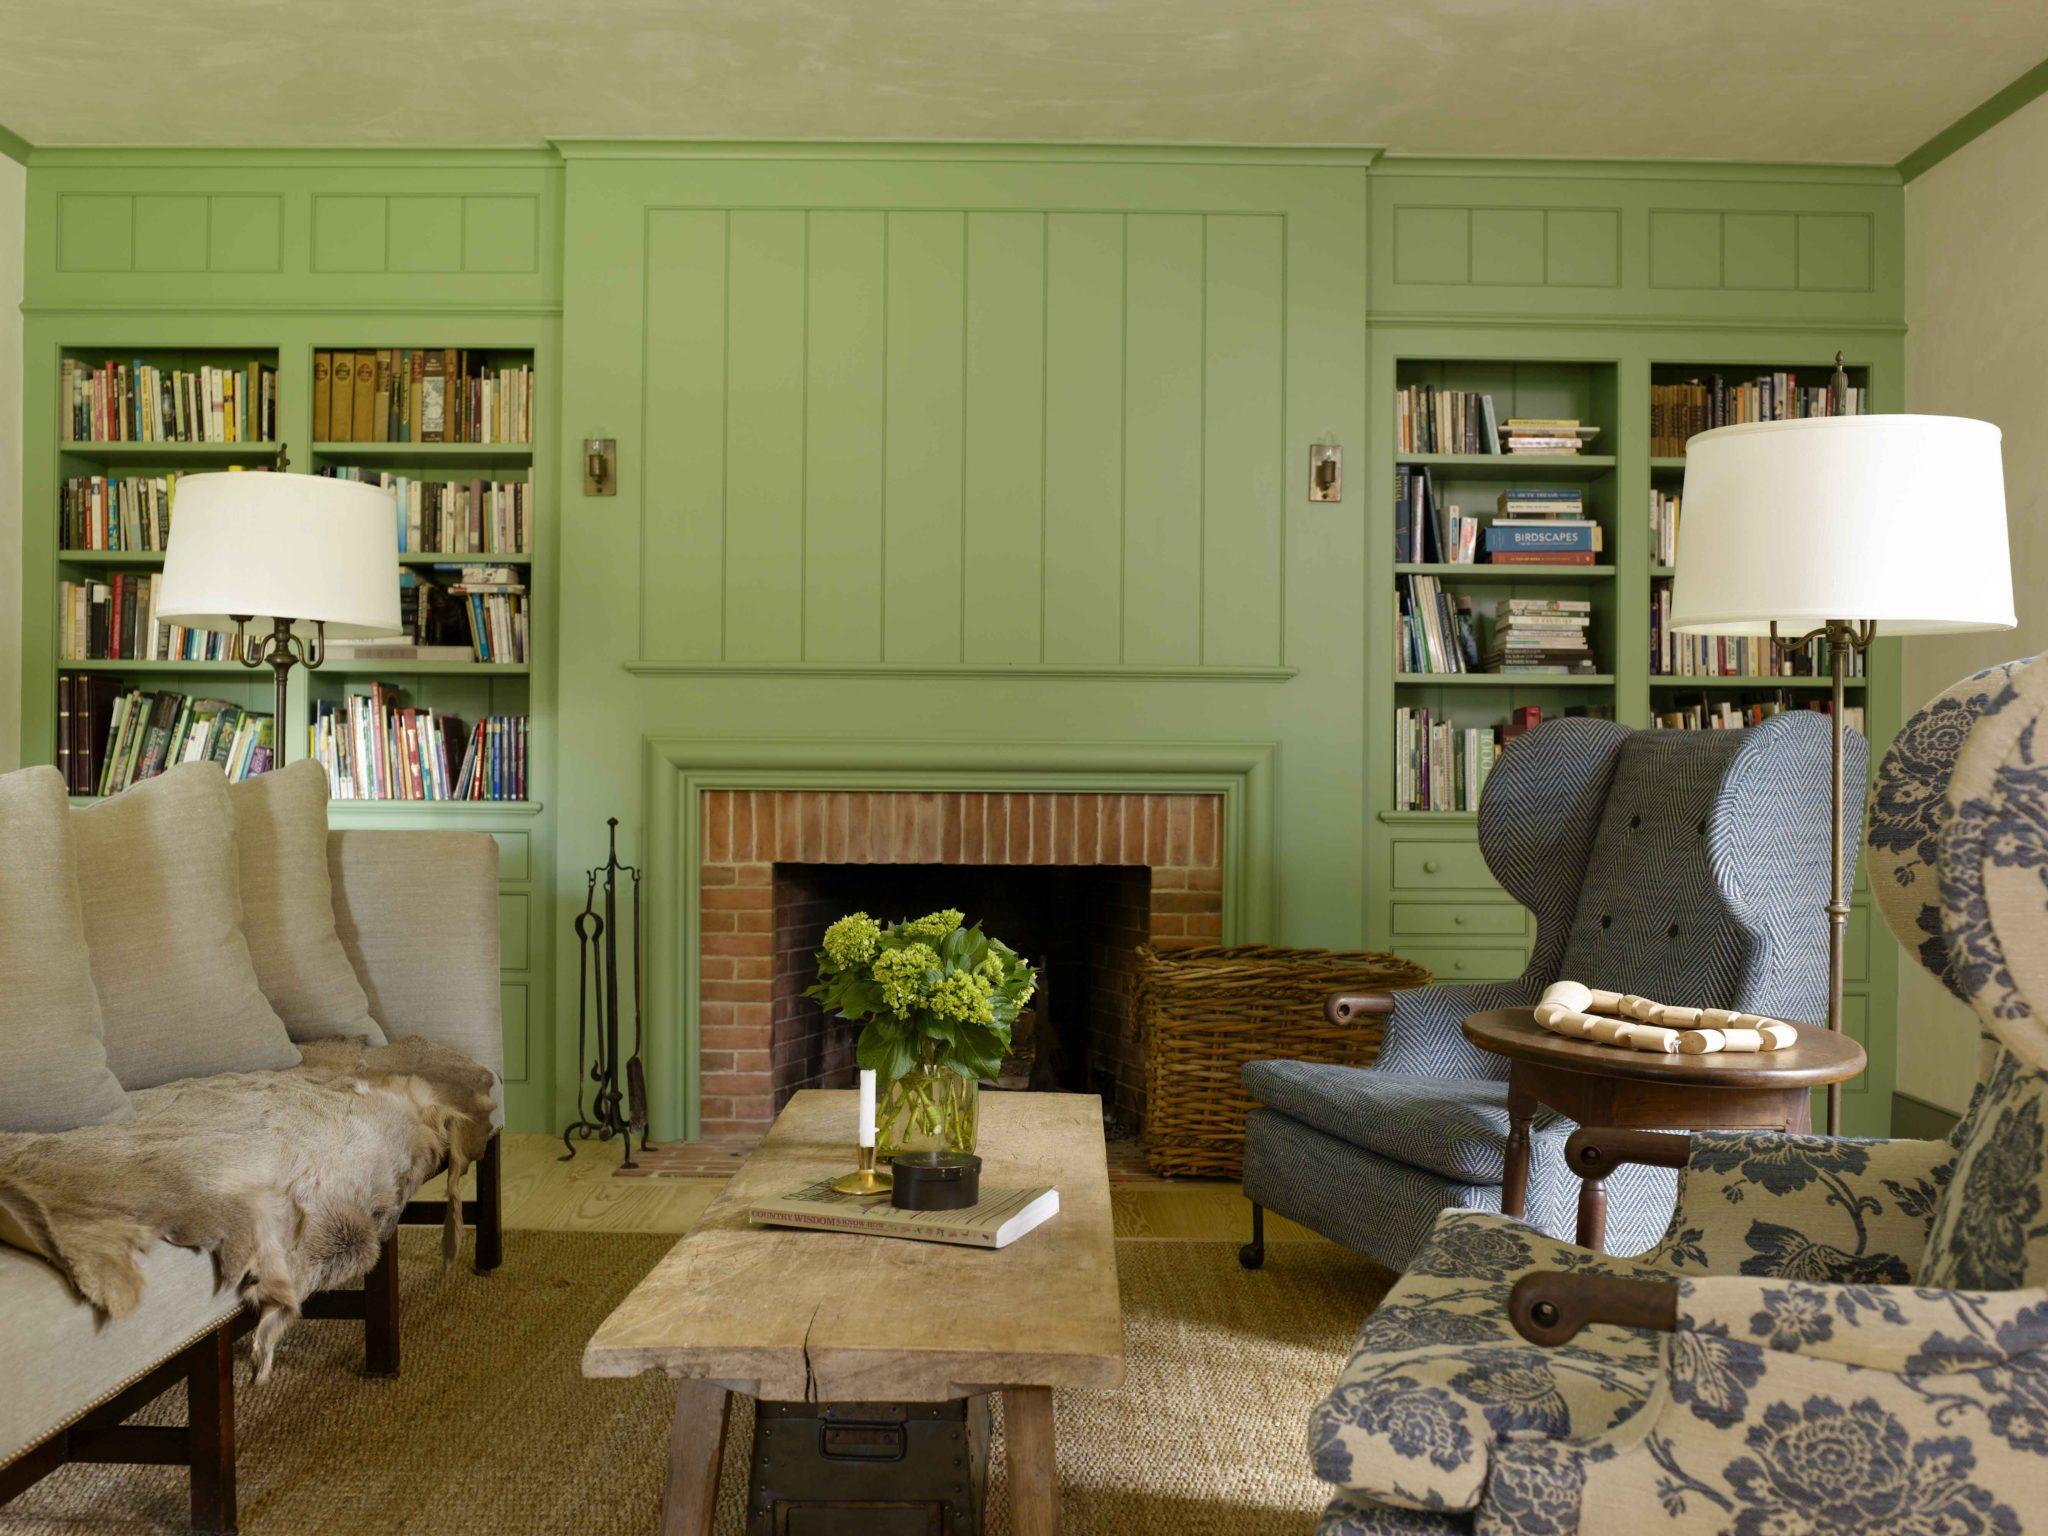 Interior design byRafe Churchill